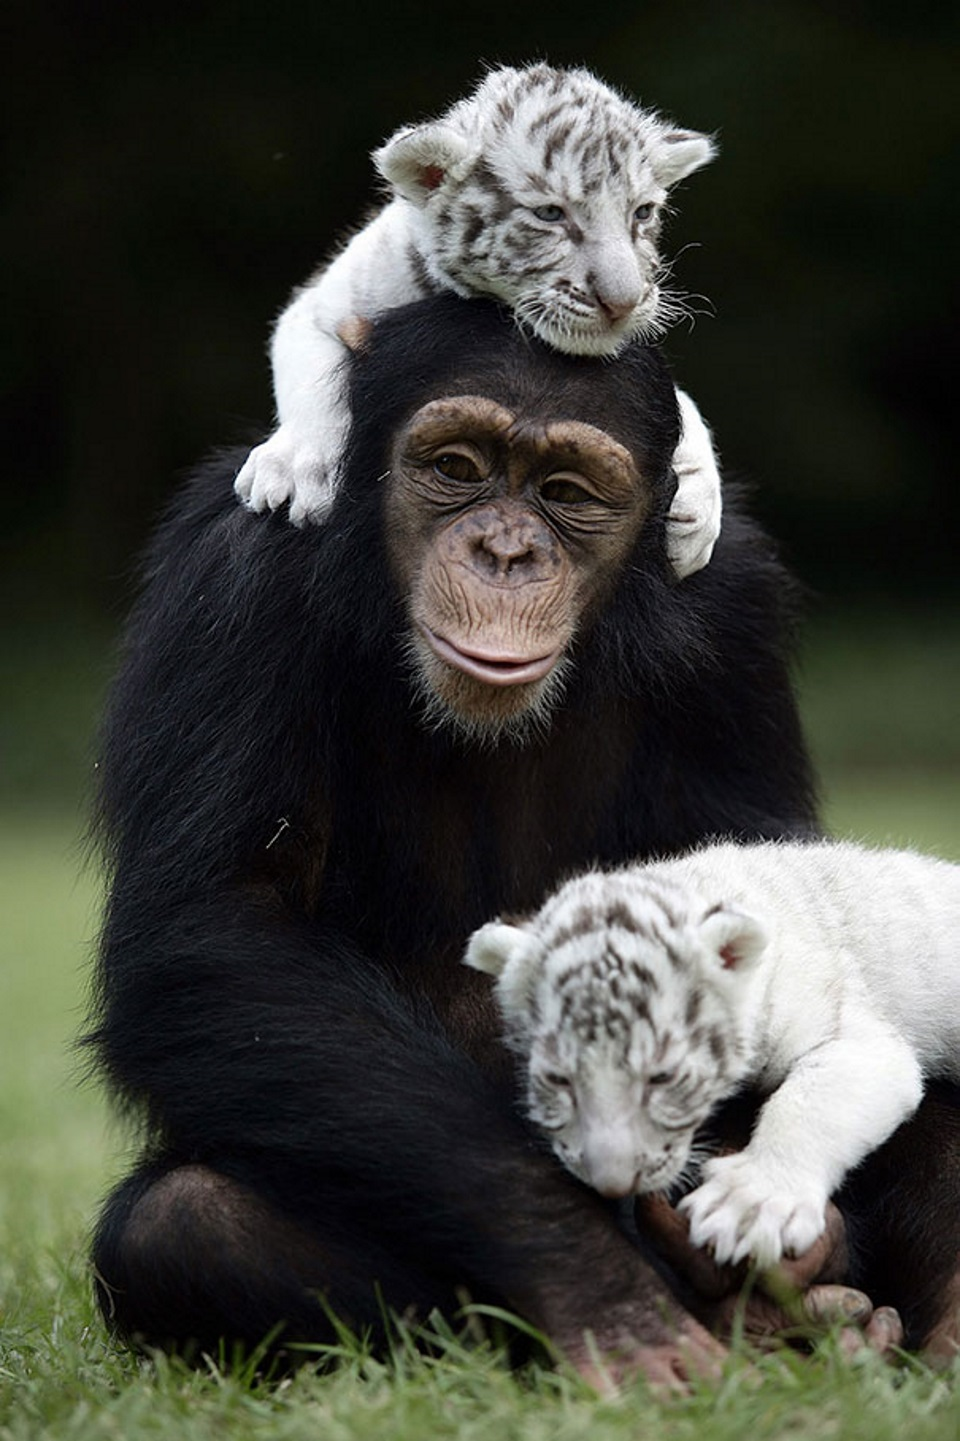 Tiger Monkey